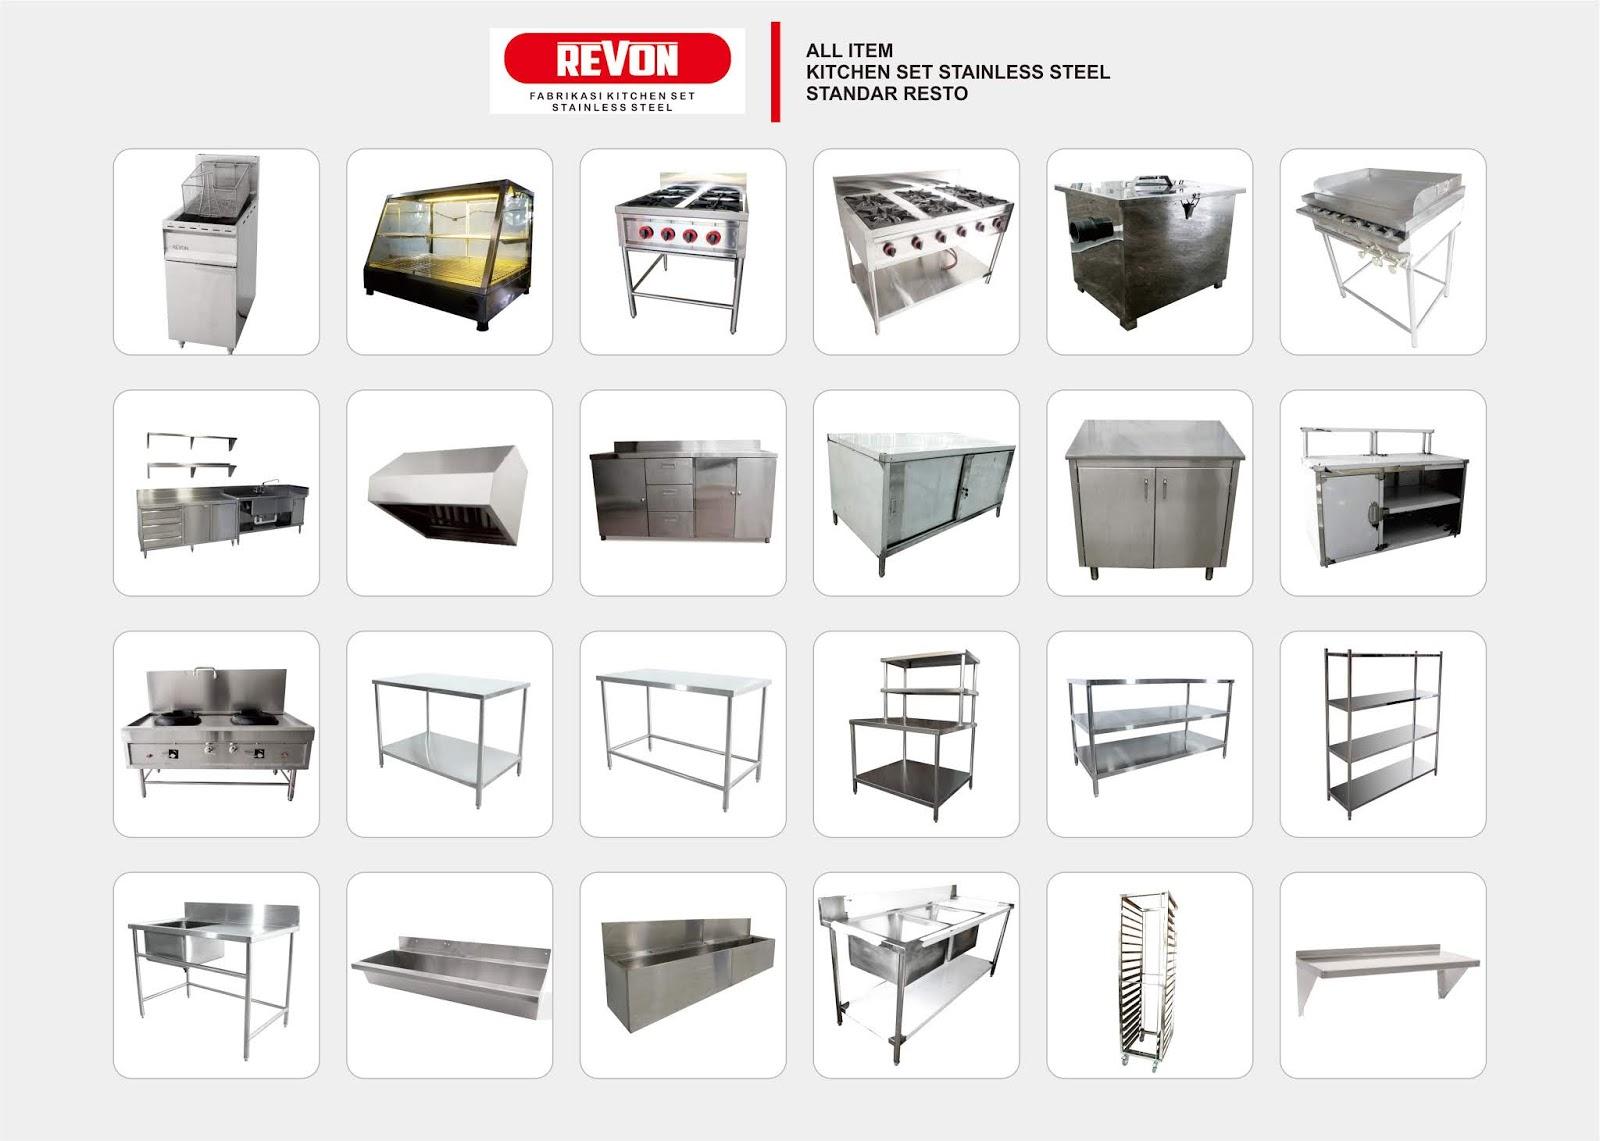 Kitchen Set Stainless Steel Resto